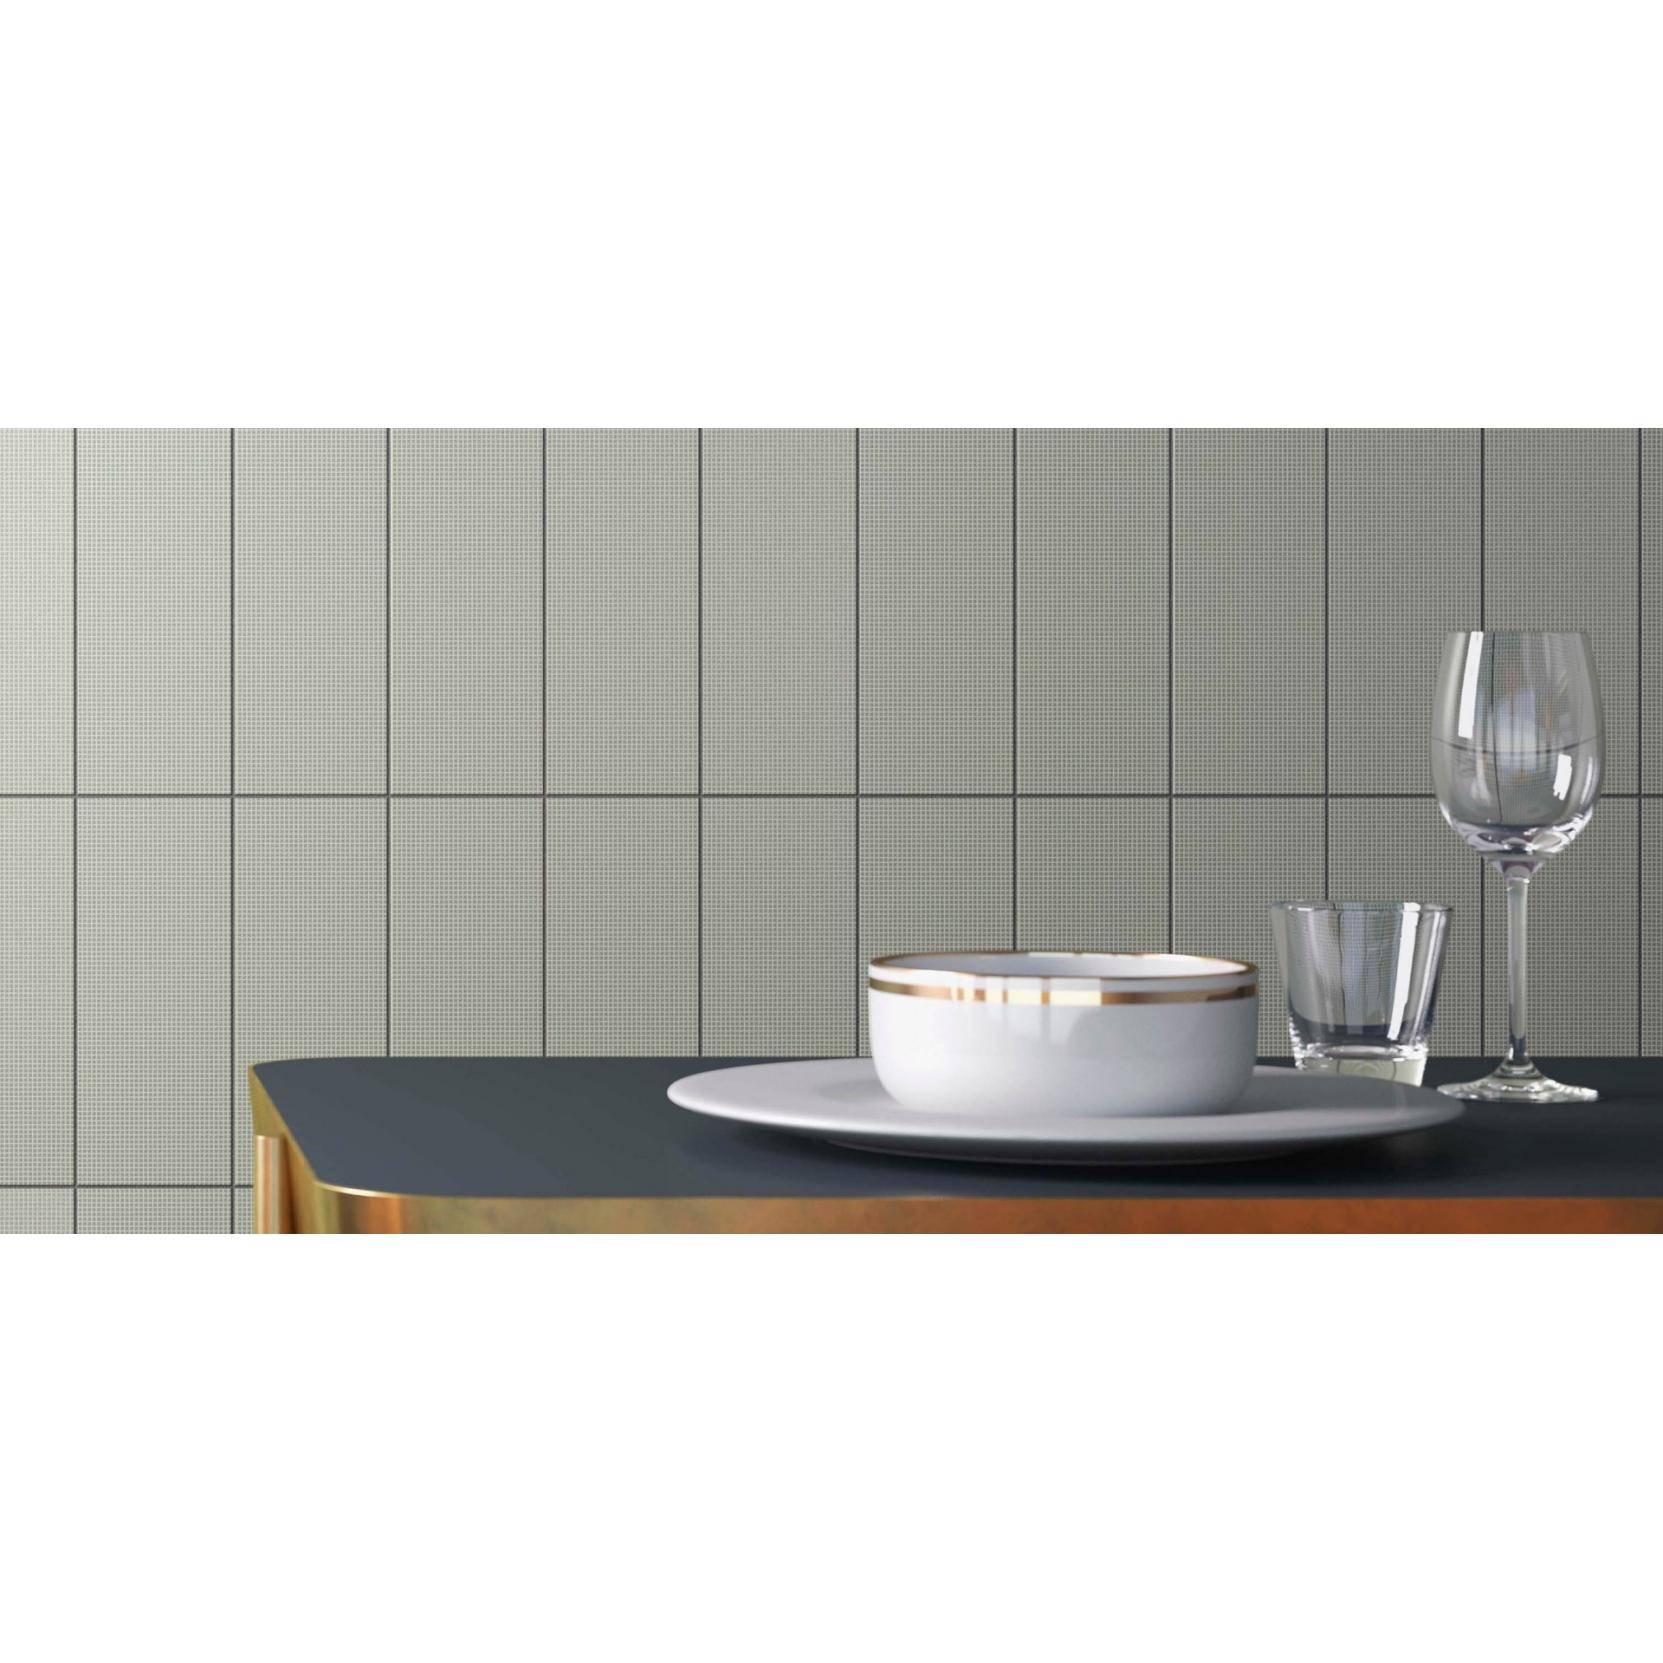 Ceramica vogue graph neutral color tattahome - Cucina freestanding usata ...